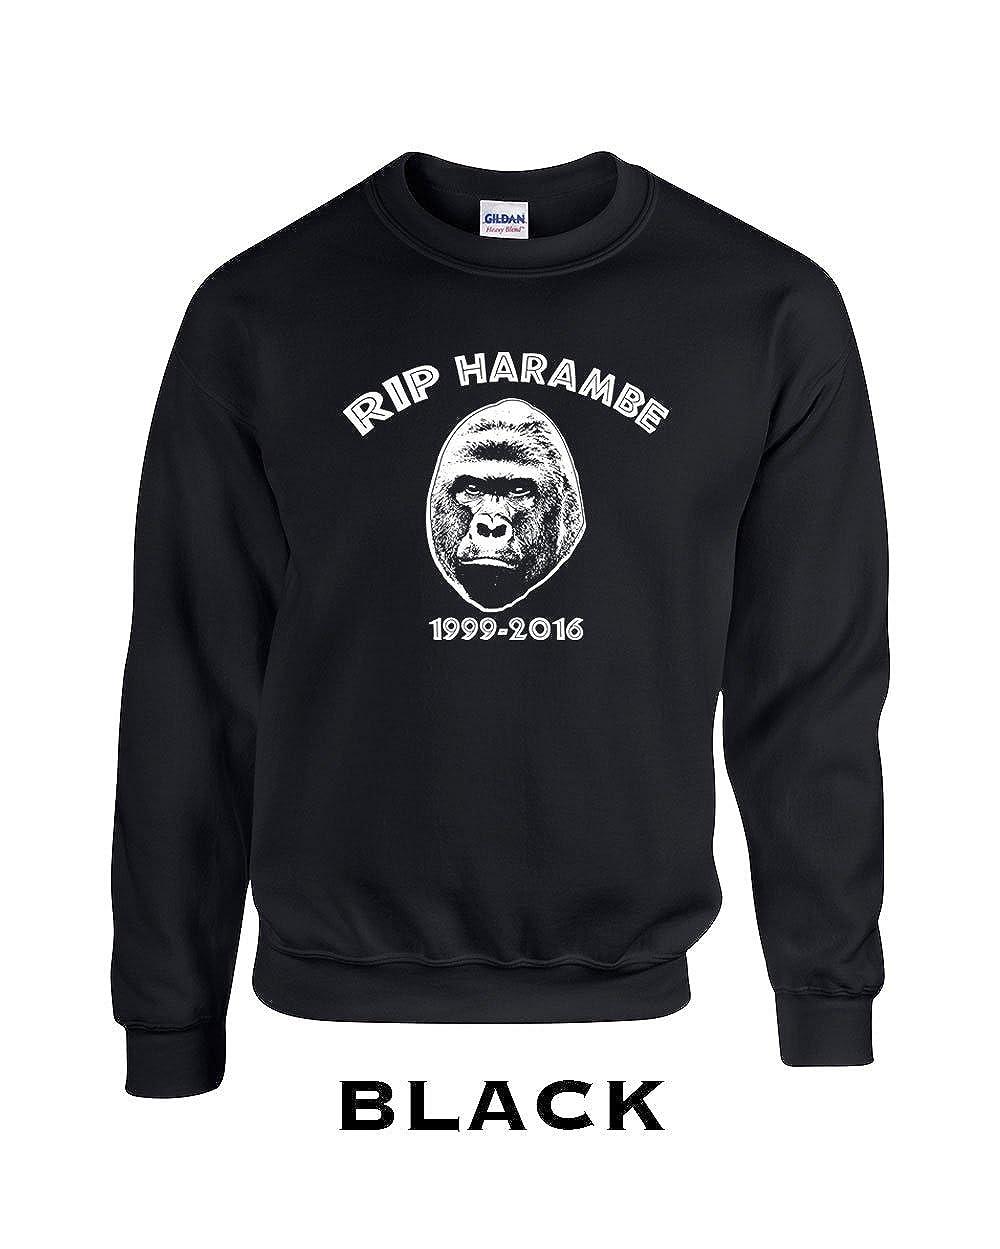 324 RIP Harambe Funny Adult Crew Sweatshirt